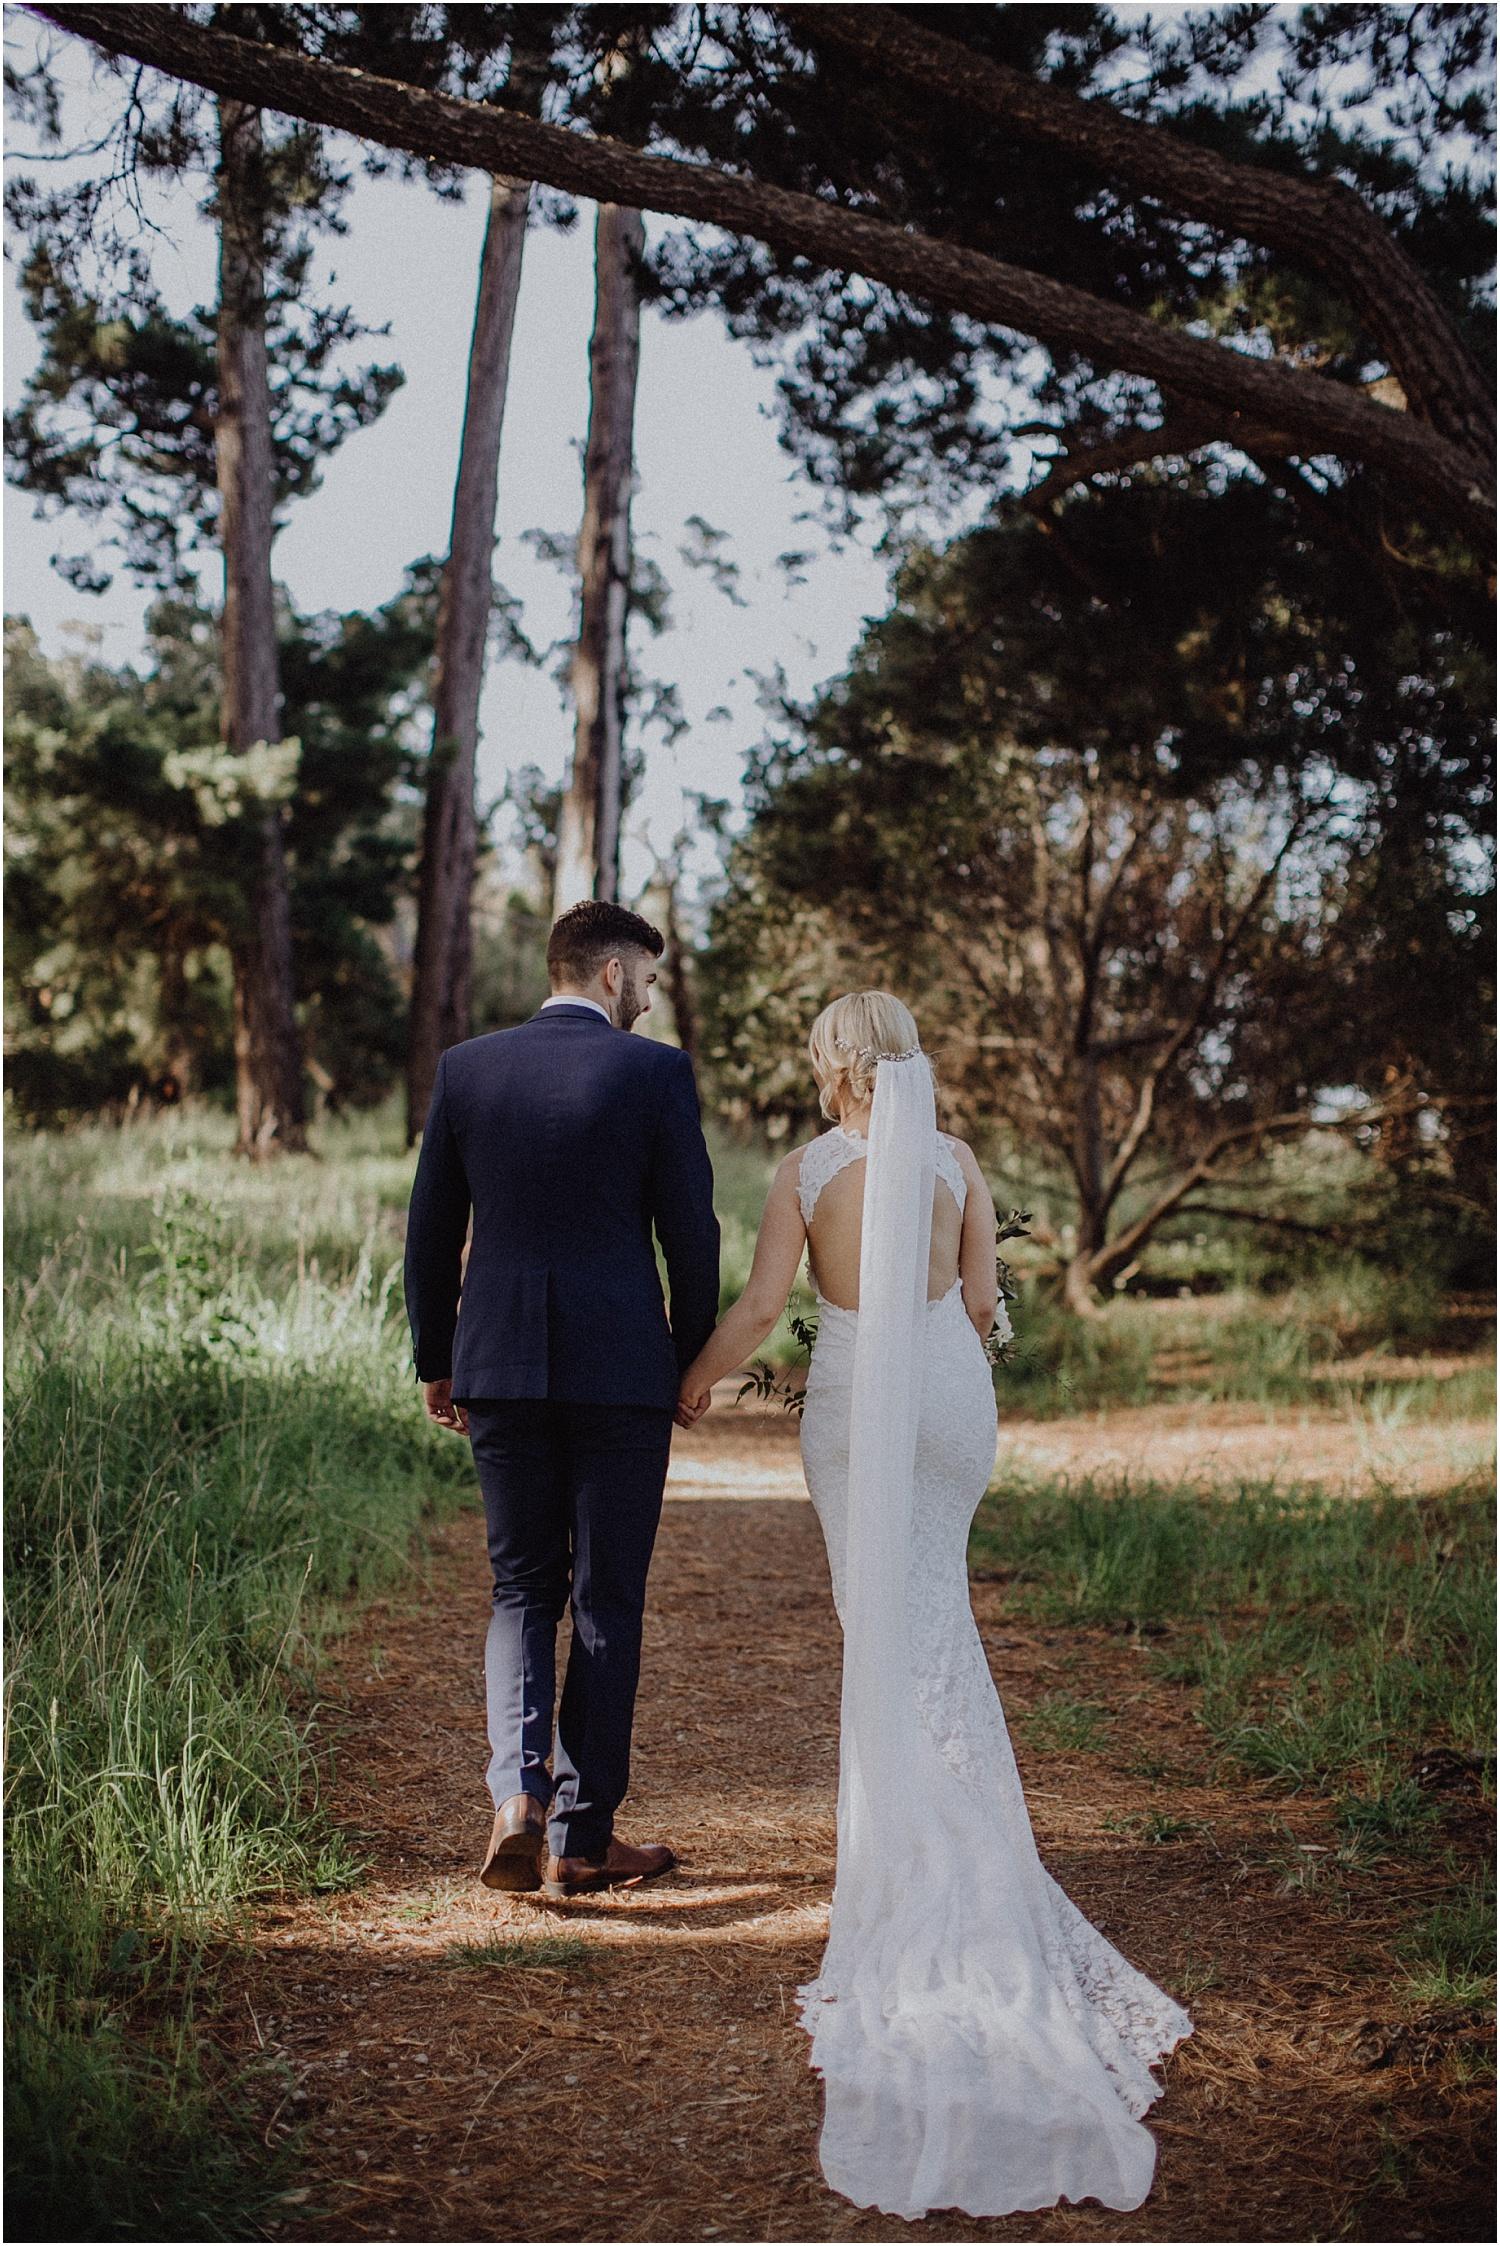 Nicolle and Damien's tipi wedding at the Flinders Yacht Club on the Mornington Peninsula._0123.jpg